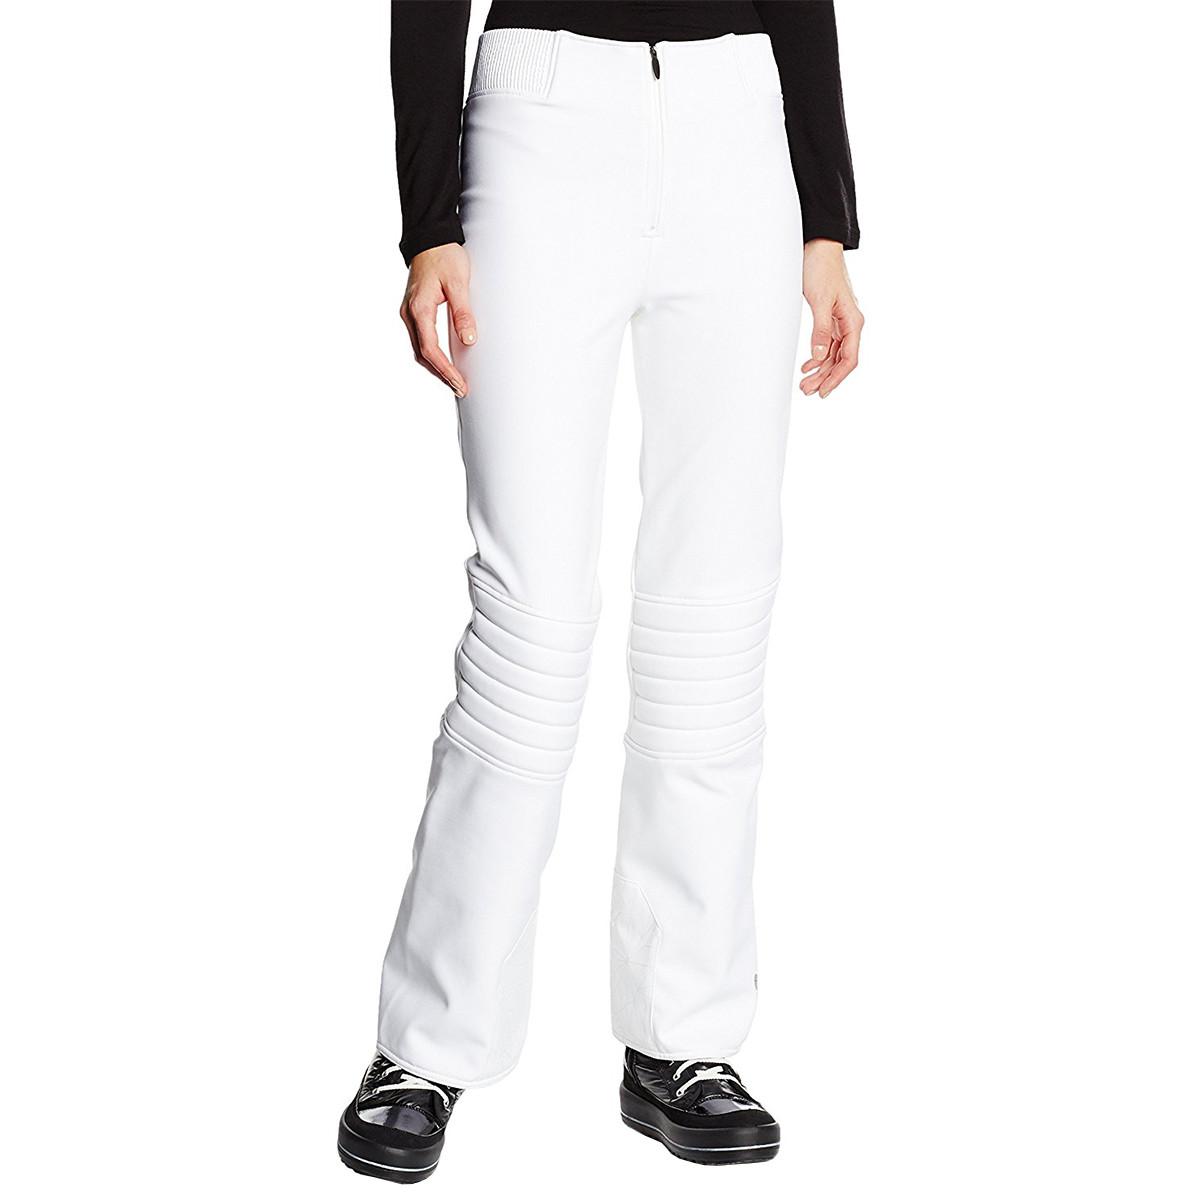 tahoe pantalon ski femme blanc pas cher pantalons ski et snowboard degre 7 discount. Black Bedroom Furniture Sets. Home Design Ideas